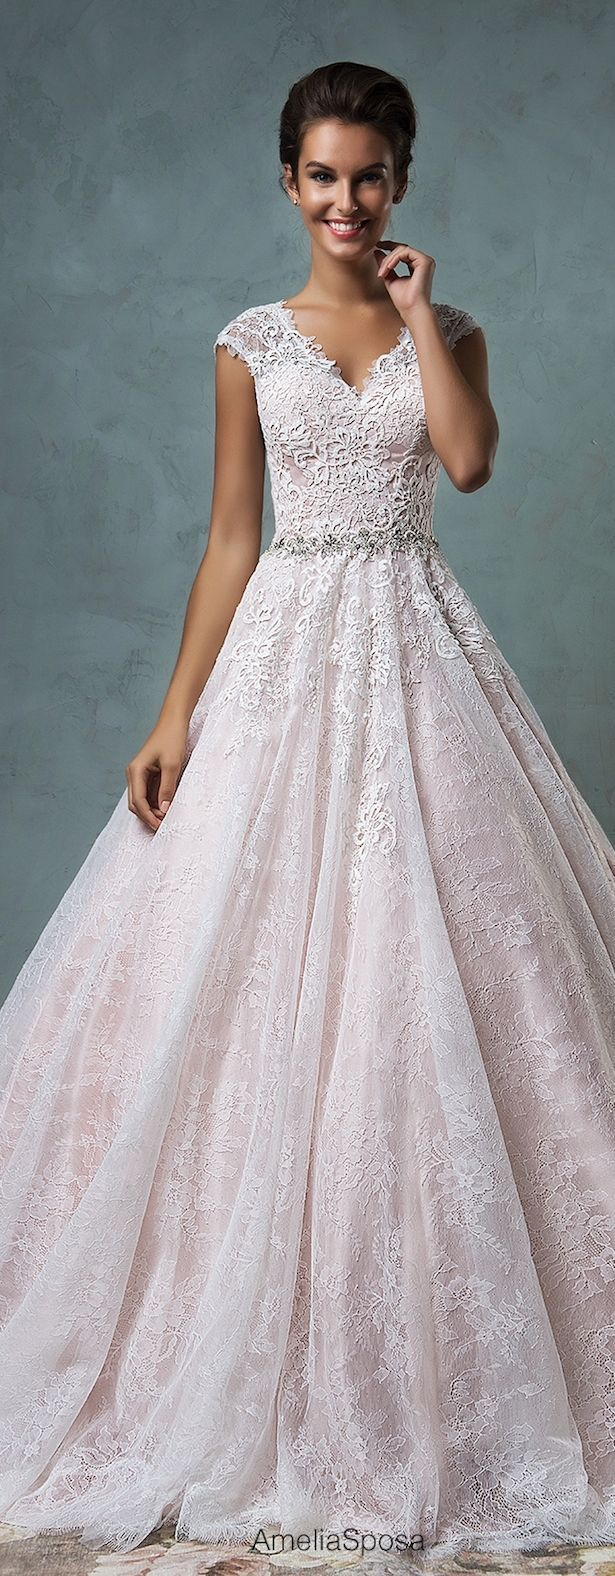 robe longue pas cher light pink wedding dress Amelia Sposa Wedding Dresses Part 2 Pale Pink